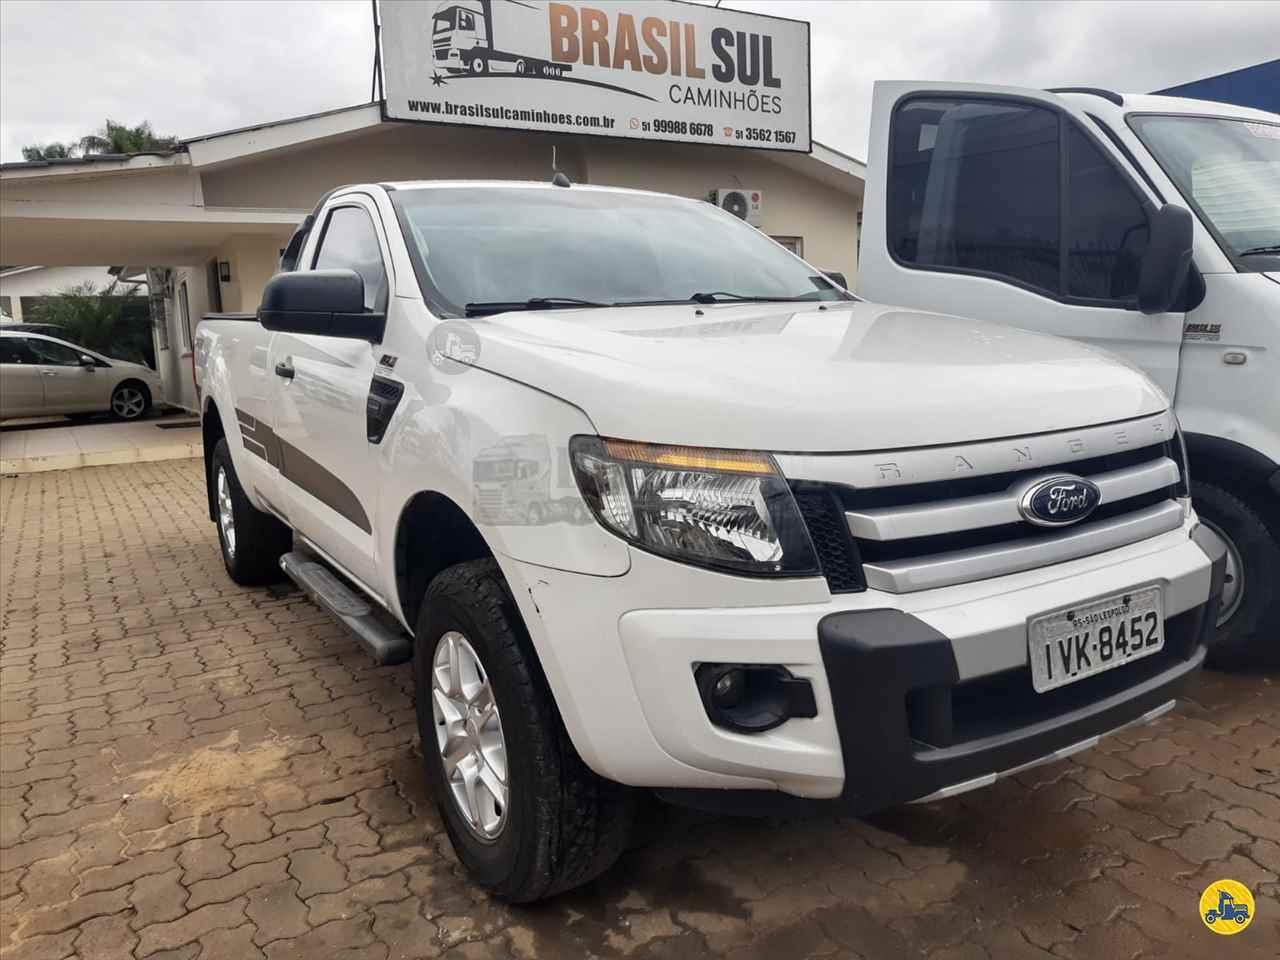 Ranger XLS 2.3 CS de Brasil Sul Caminhões - PORTAO/RS